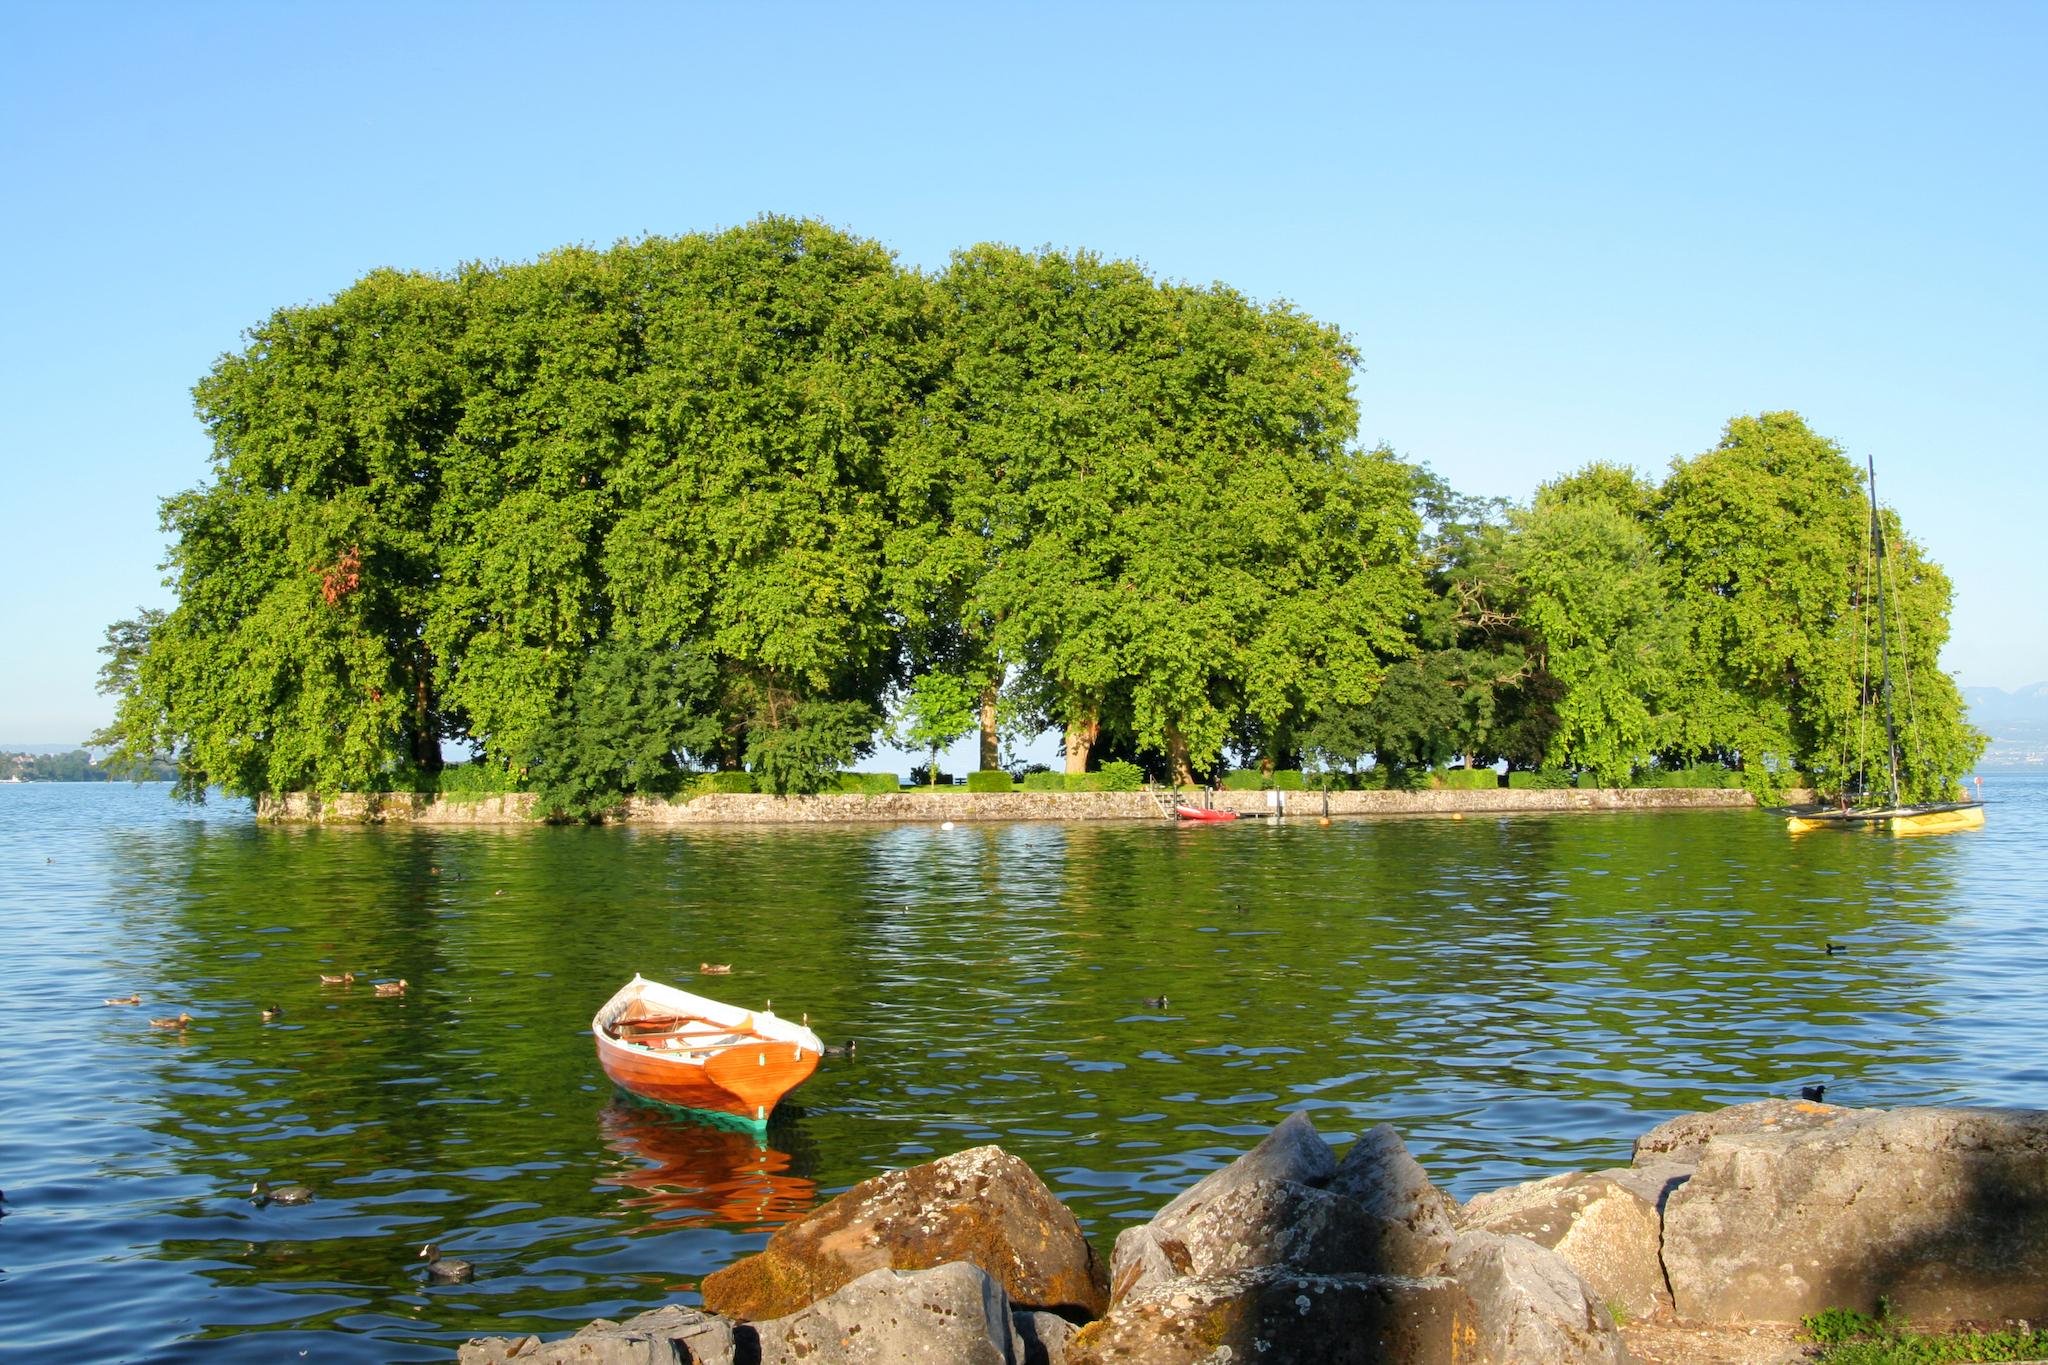 Île de la Harpe, Lake Geneva Region. for Swiss Islands Switzerland Tourism campaign. Do not reuse.